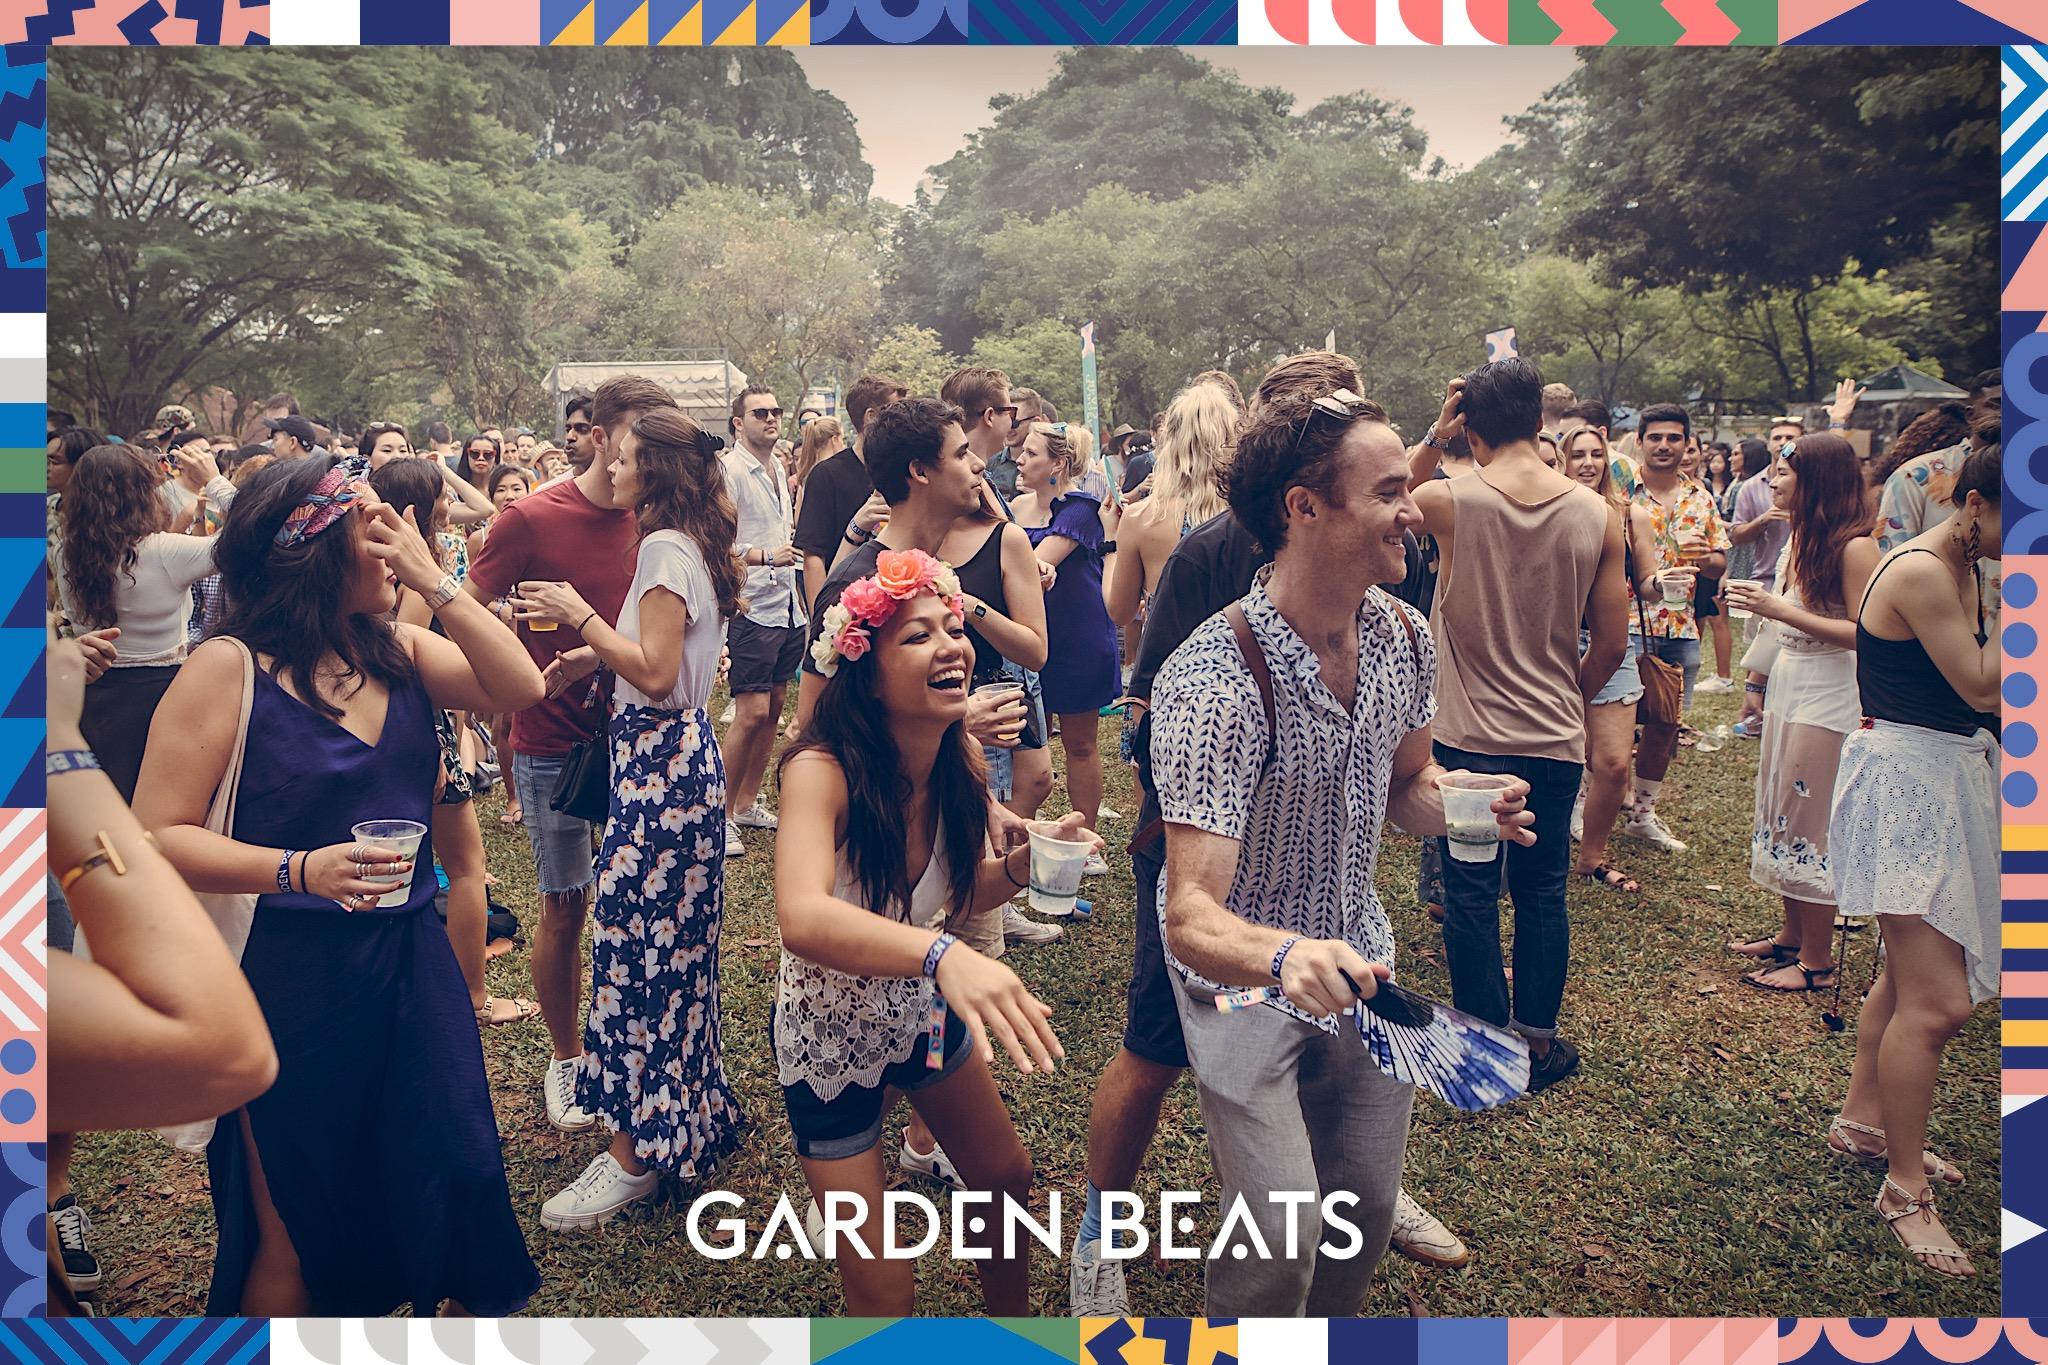 03032018_GardenBeats_Colossal612_Watermarked.jpg